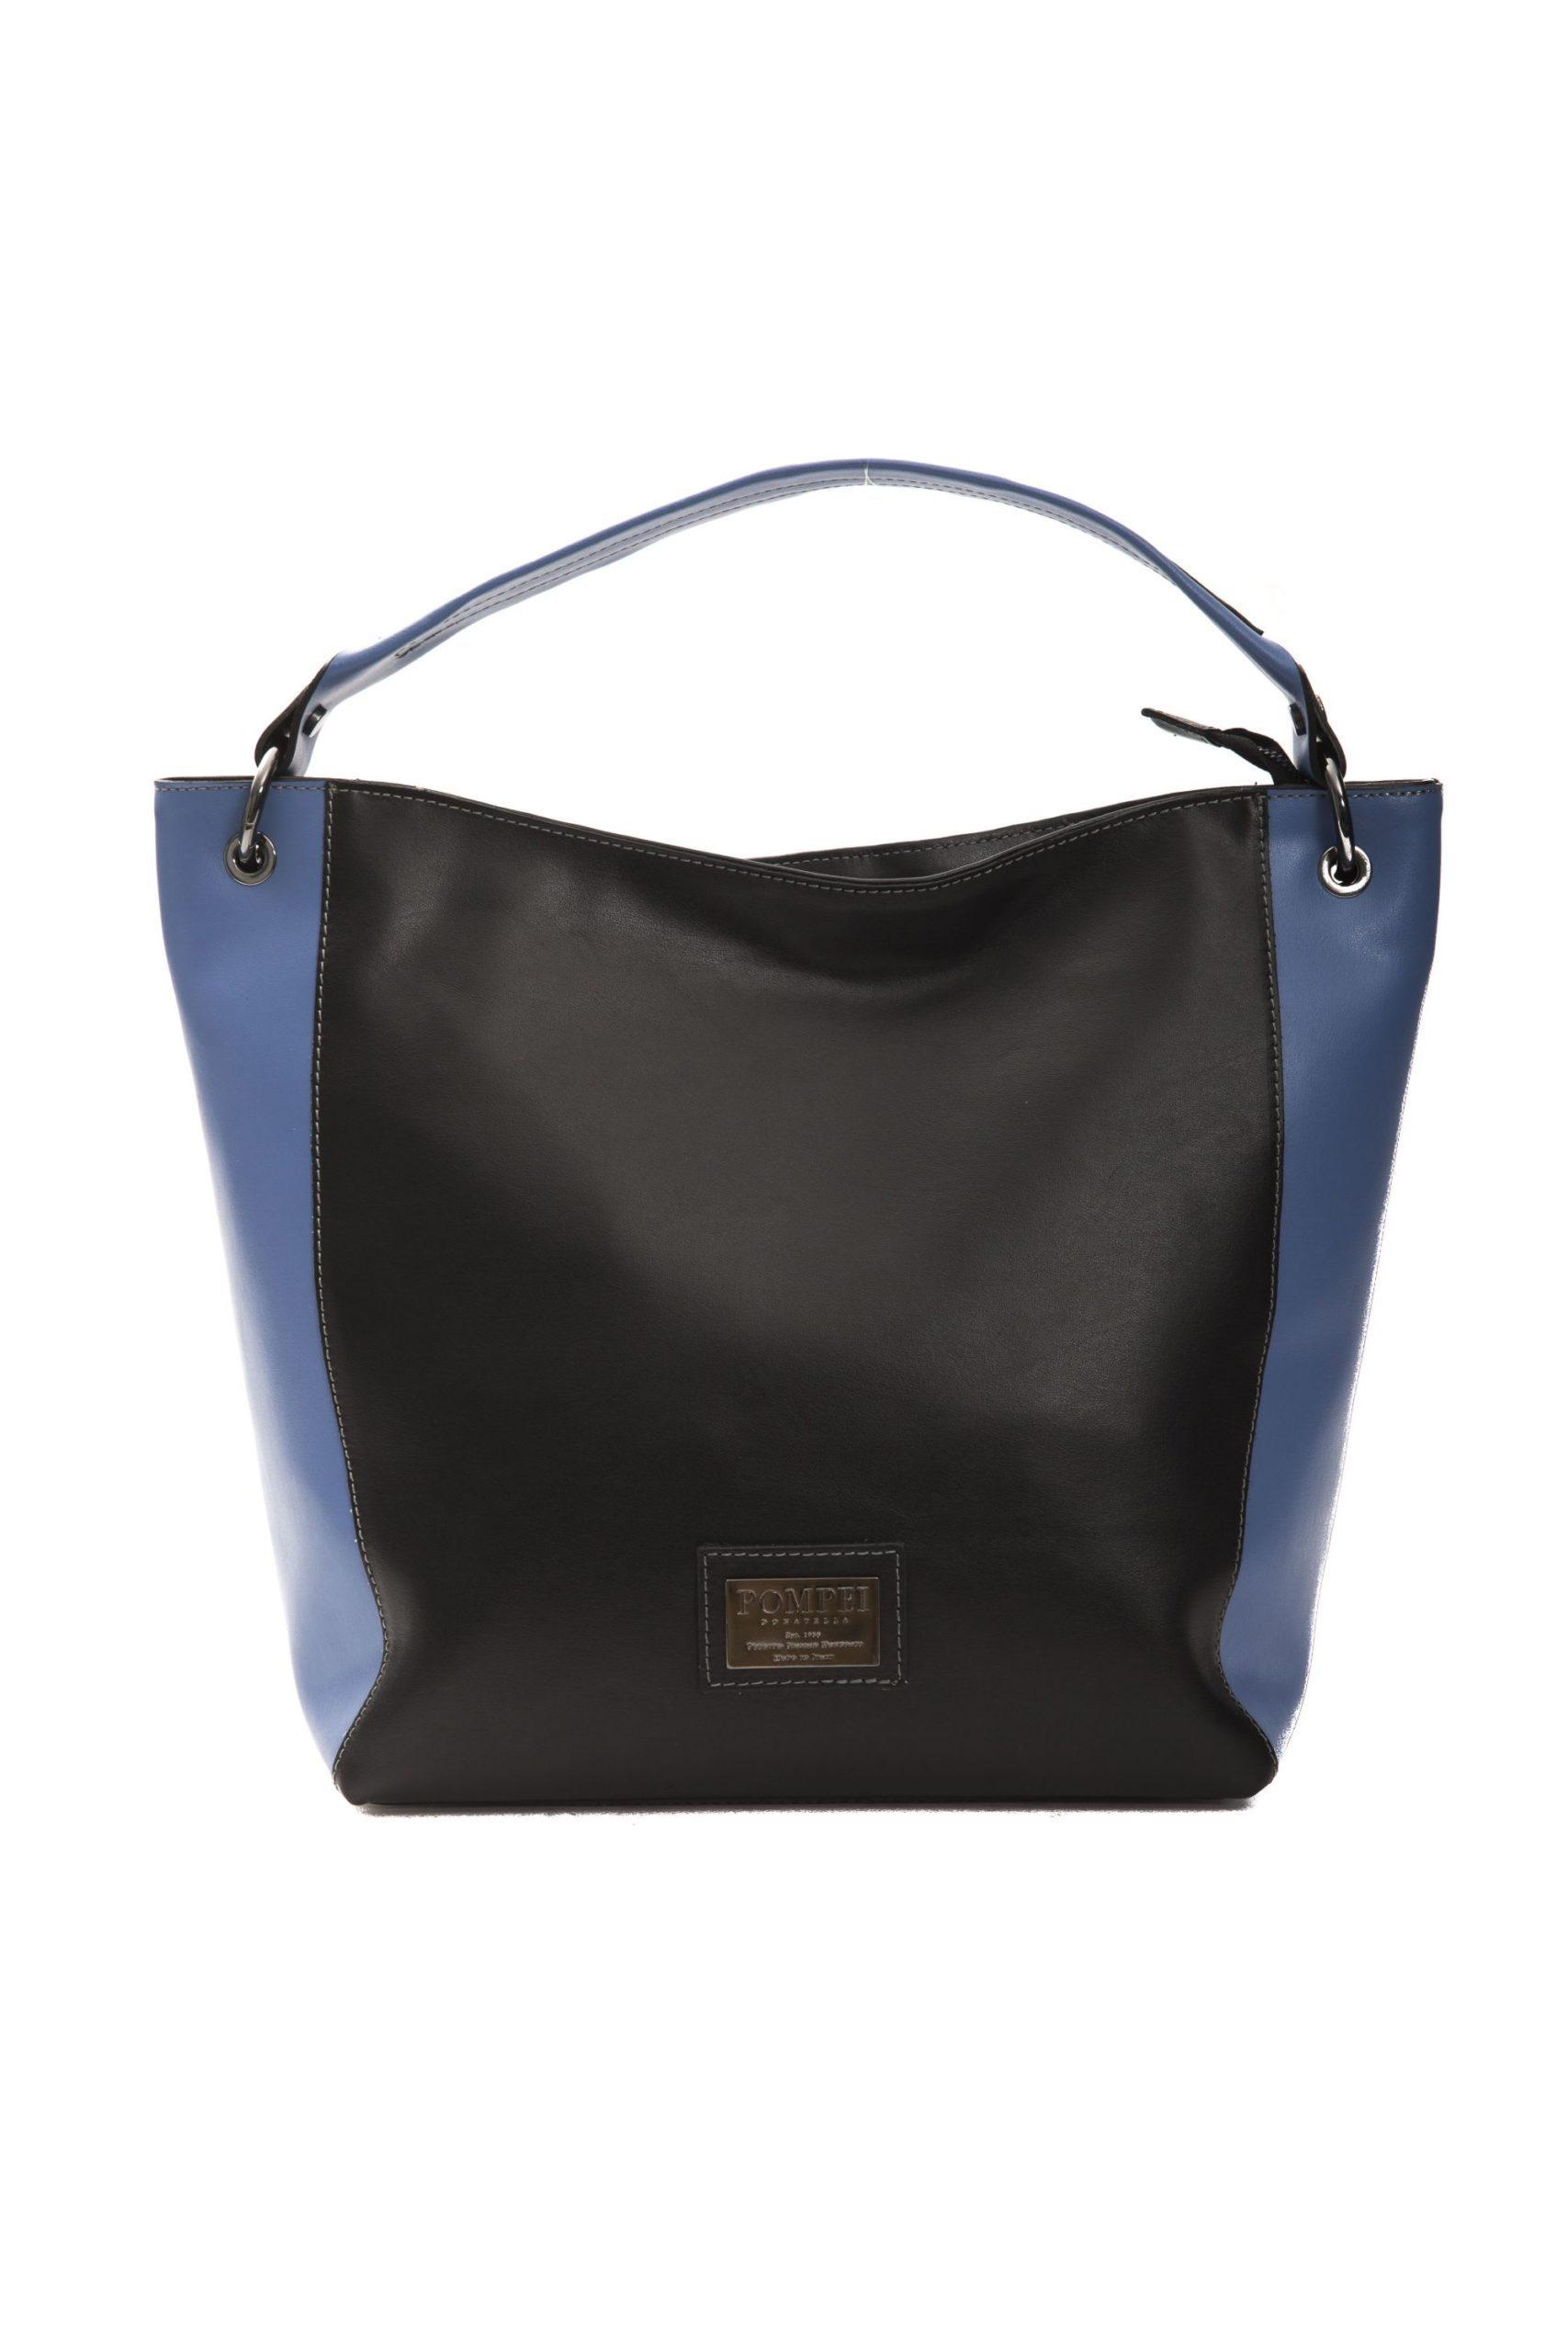 Pompei Donatella Women's Avio Nero Shoulder Bag Black PO1004639